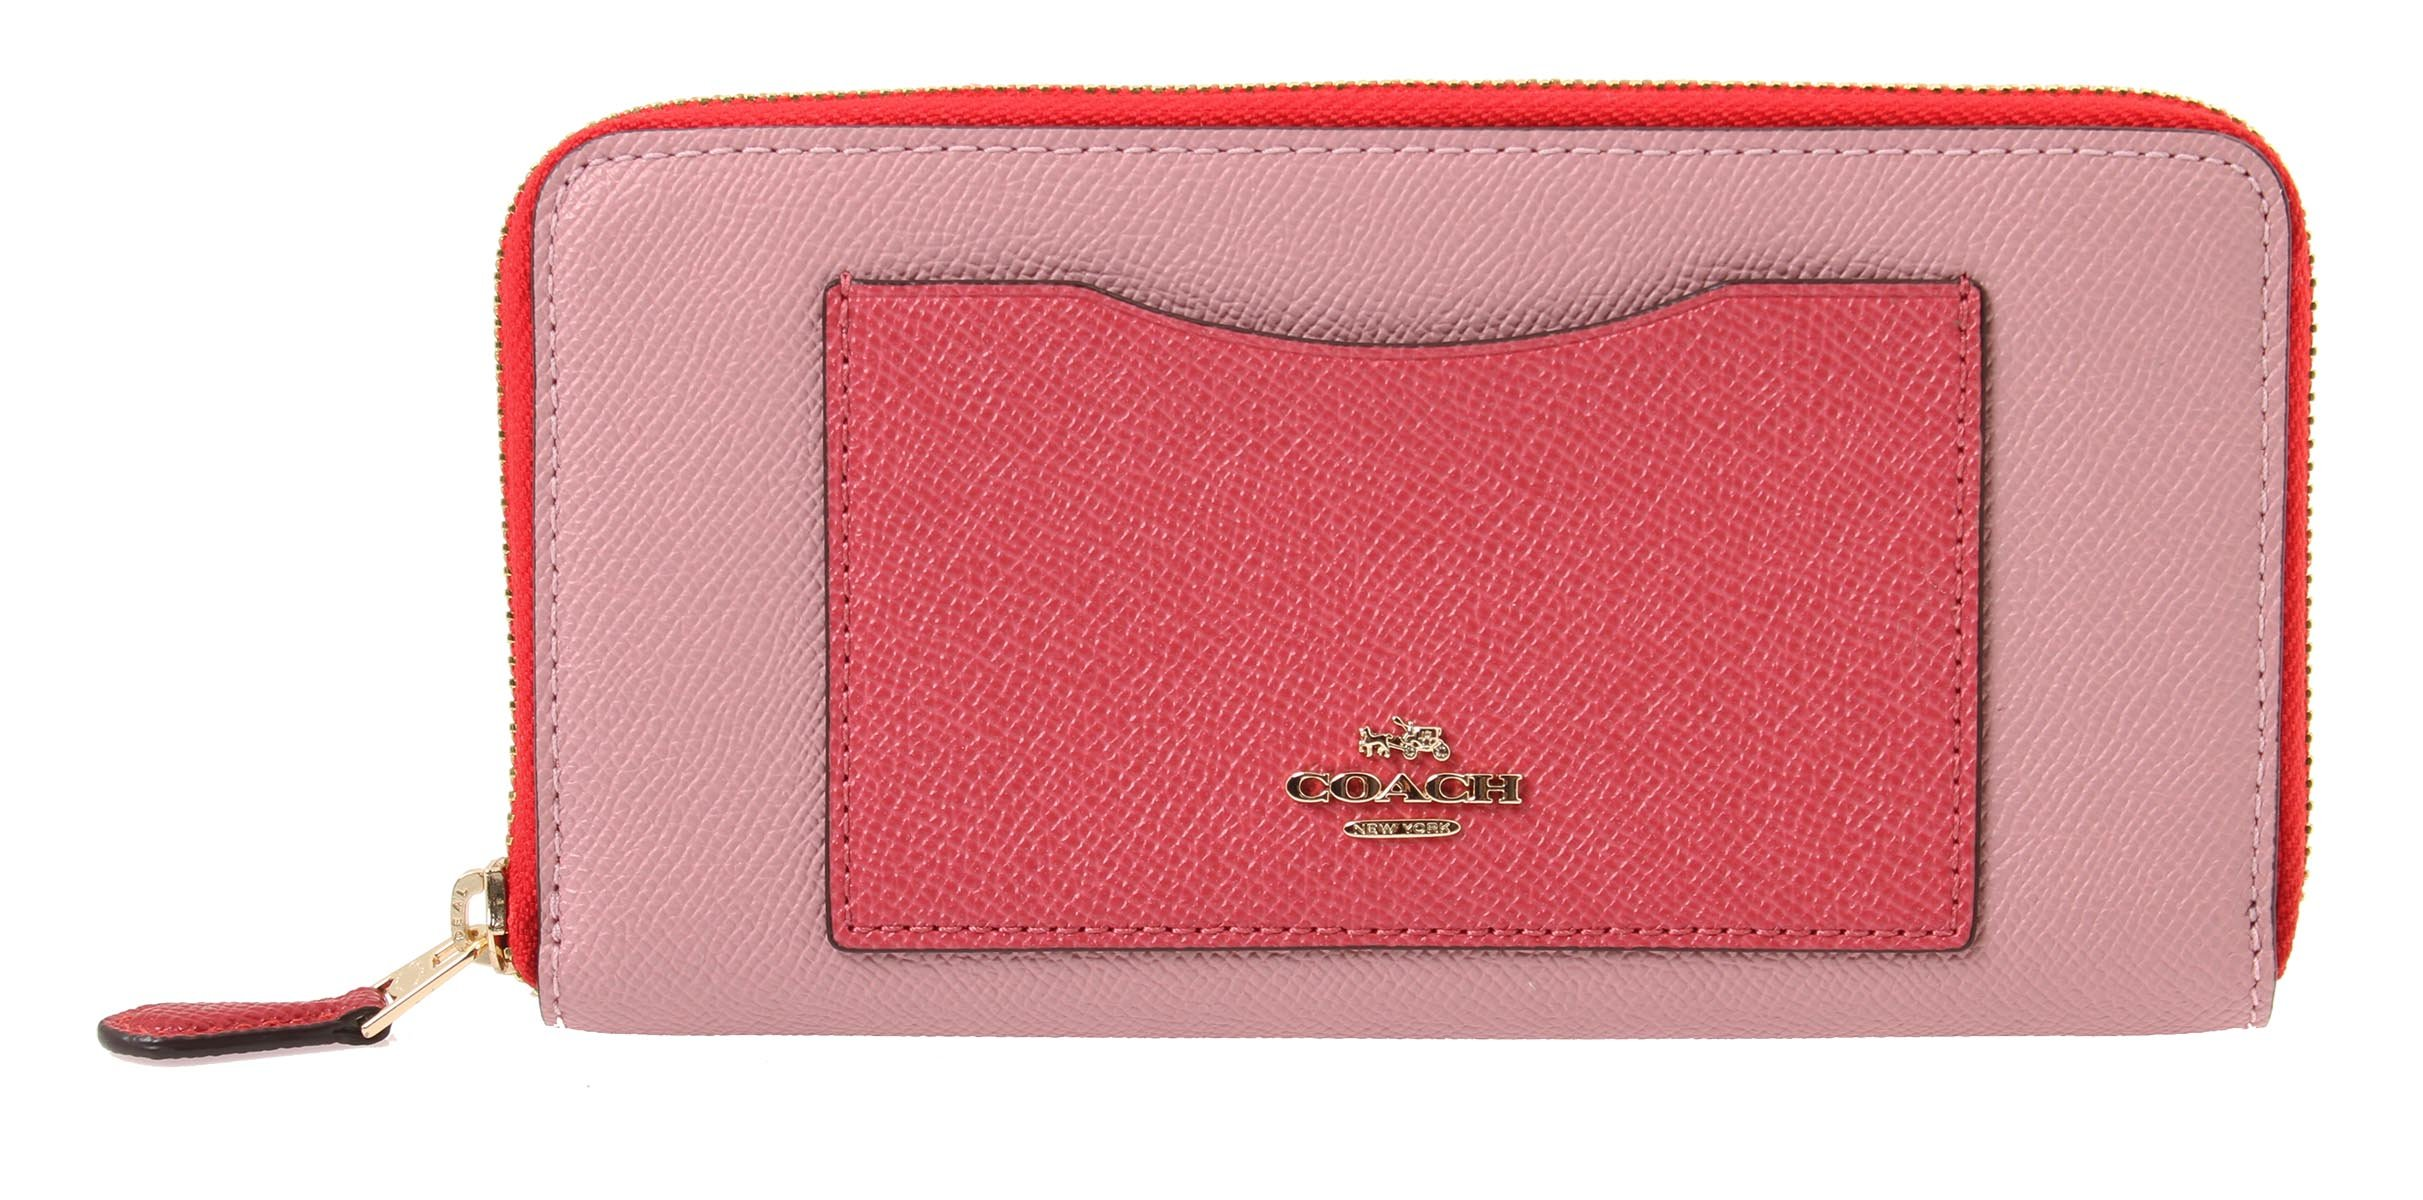 Coach Accordion Zip Wallet in Geometric ColorBlock, F57605 (Strawberry/Oxblood Multi)